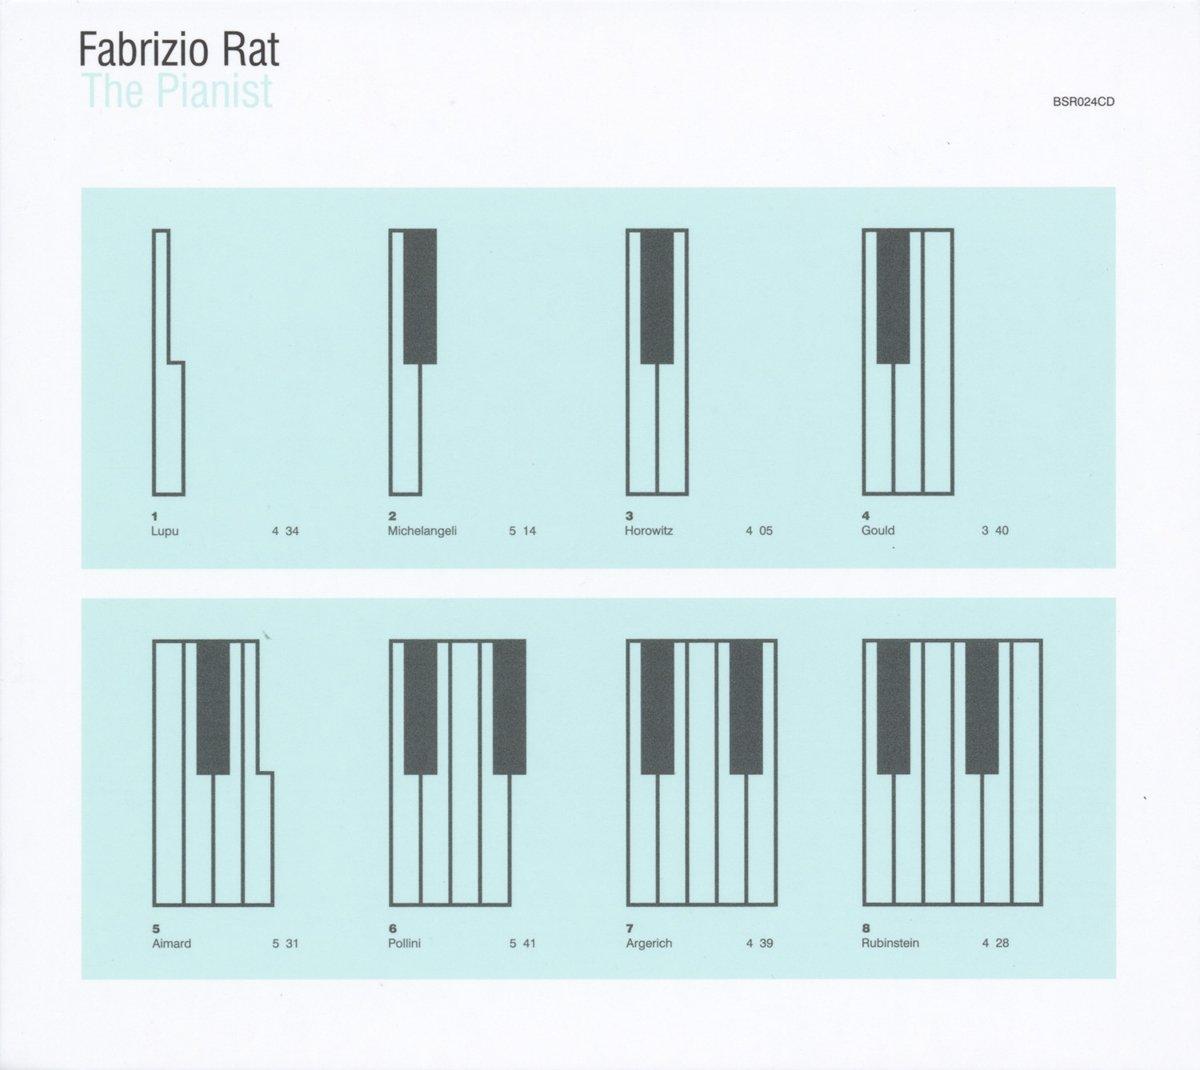 Fabrizio Rat - Pianist (United Kingdom - Import)